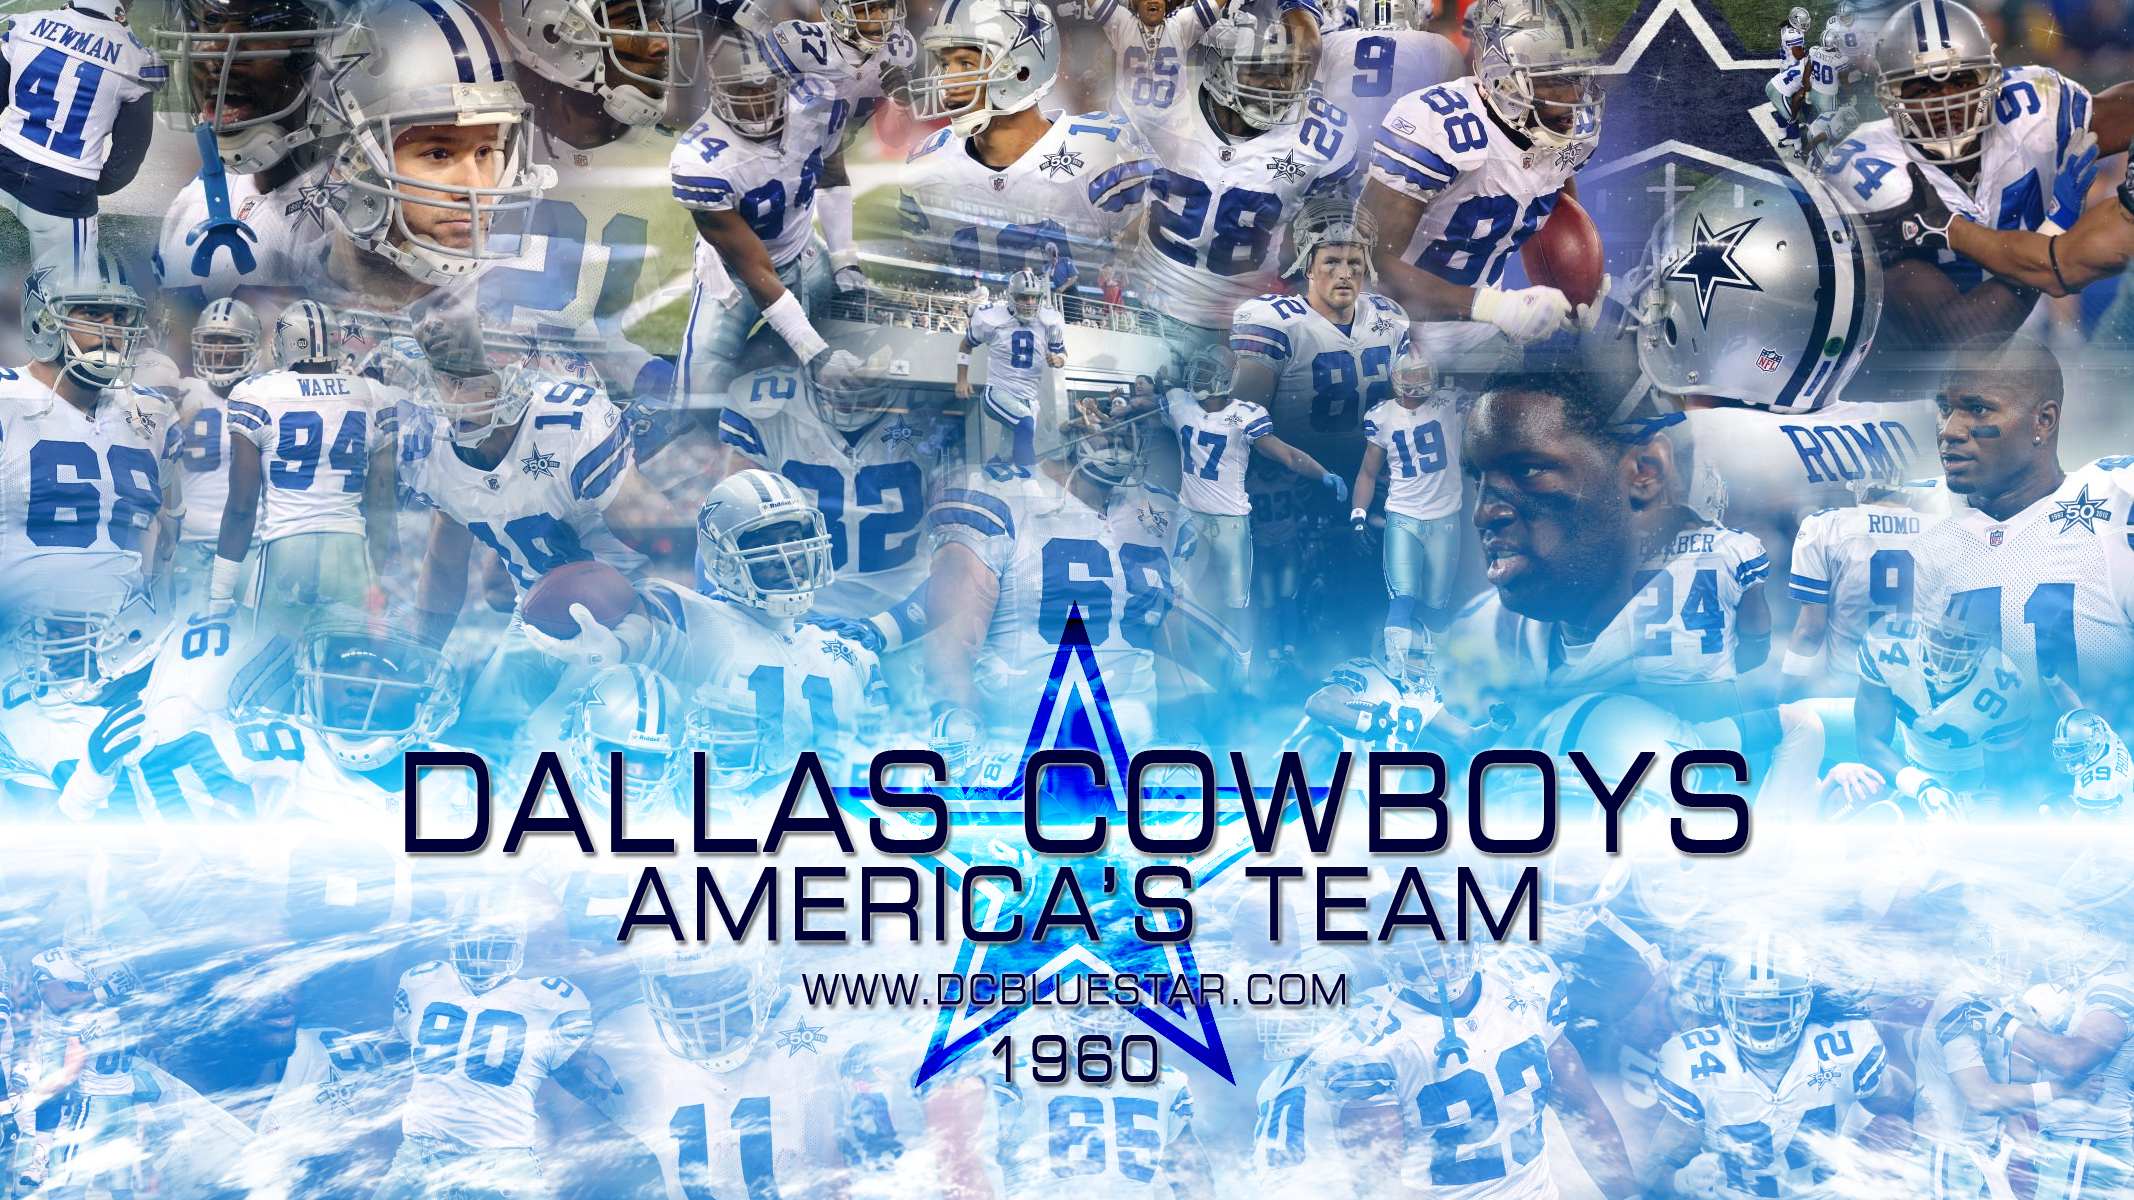 Dallas Cowboys Wallpaper Widescreen 6976423 2134x1200